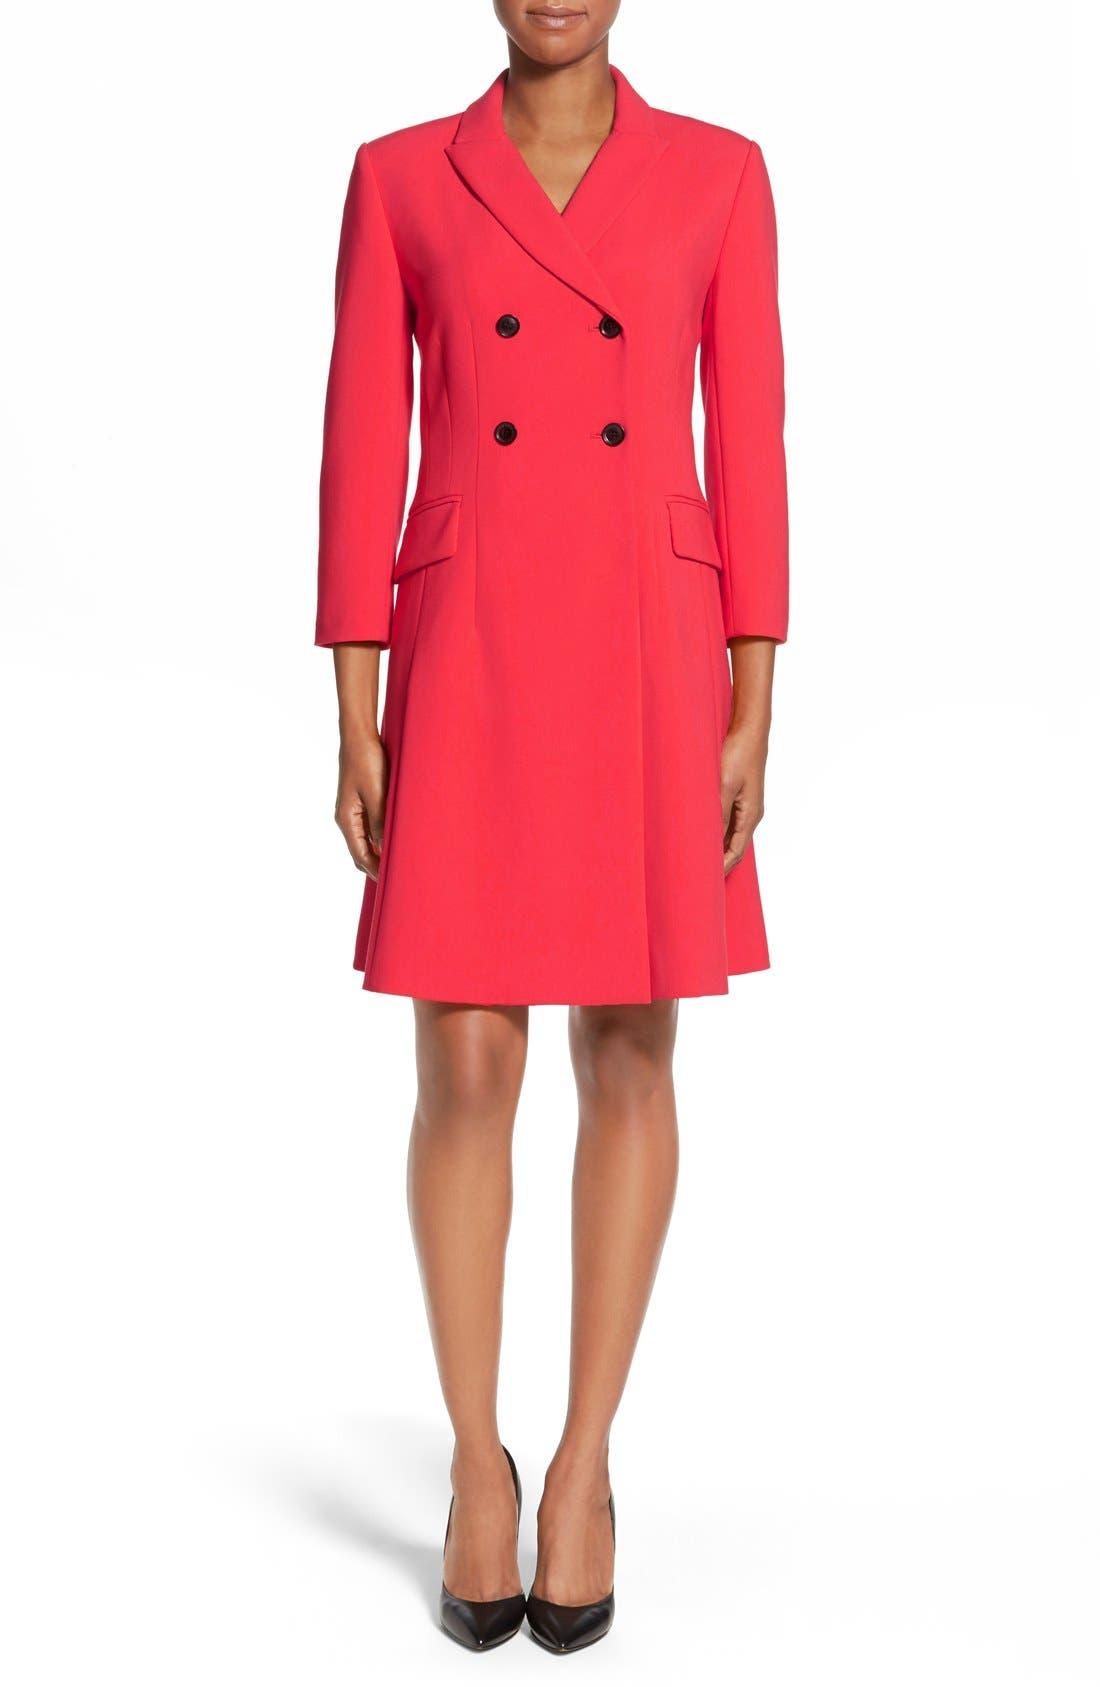 Alternate Image 1 Selected - Ellen Tracy Double Weave Coatdress (Regular & Petite)